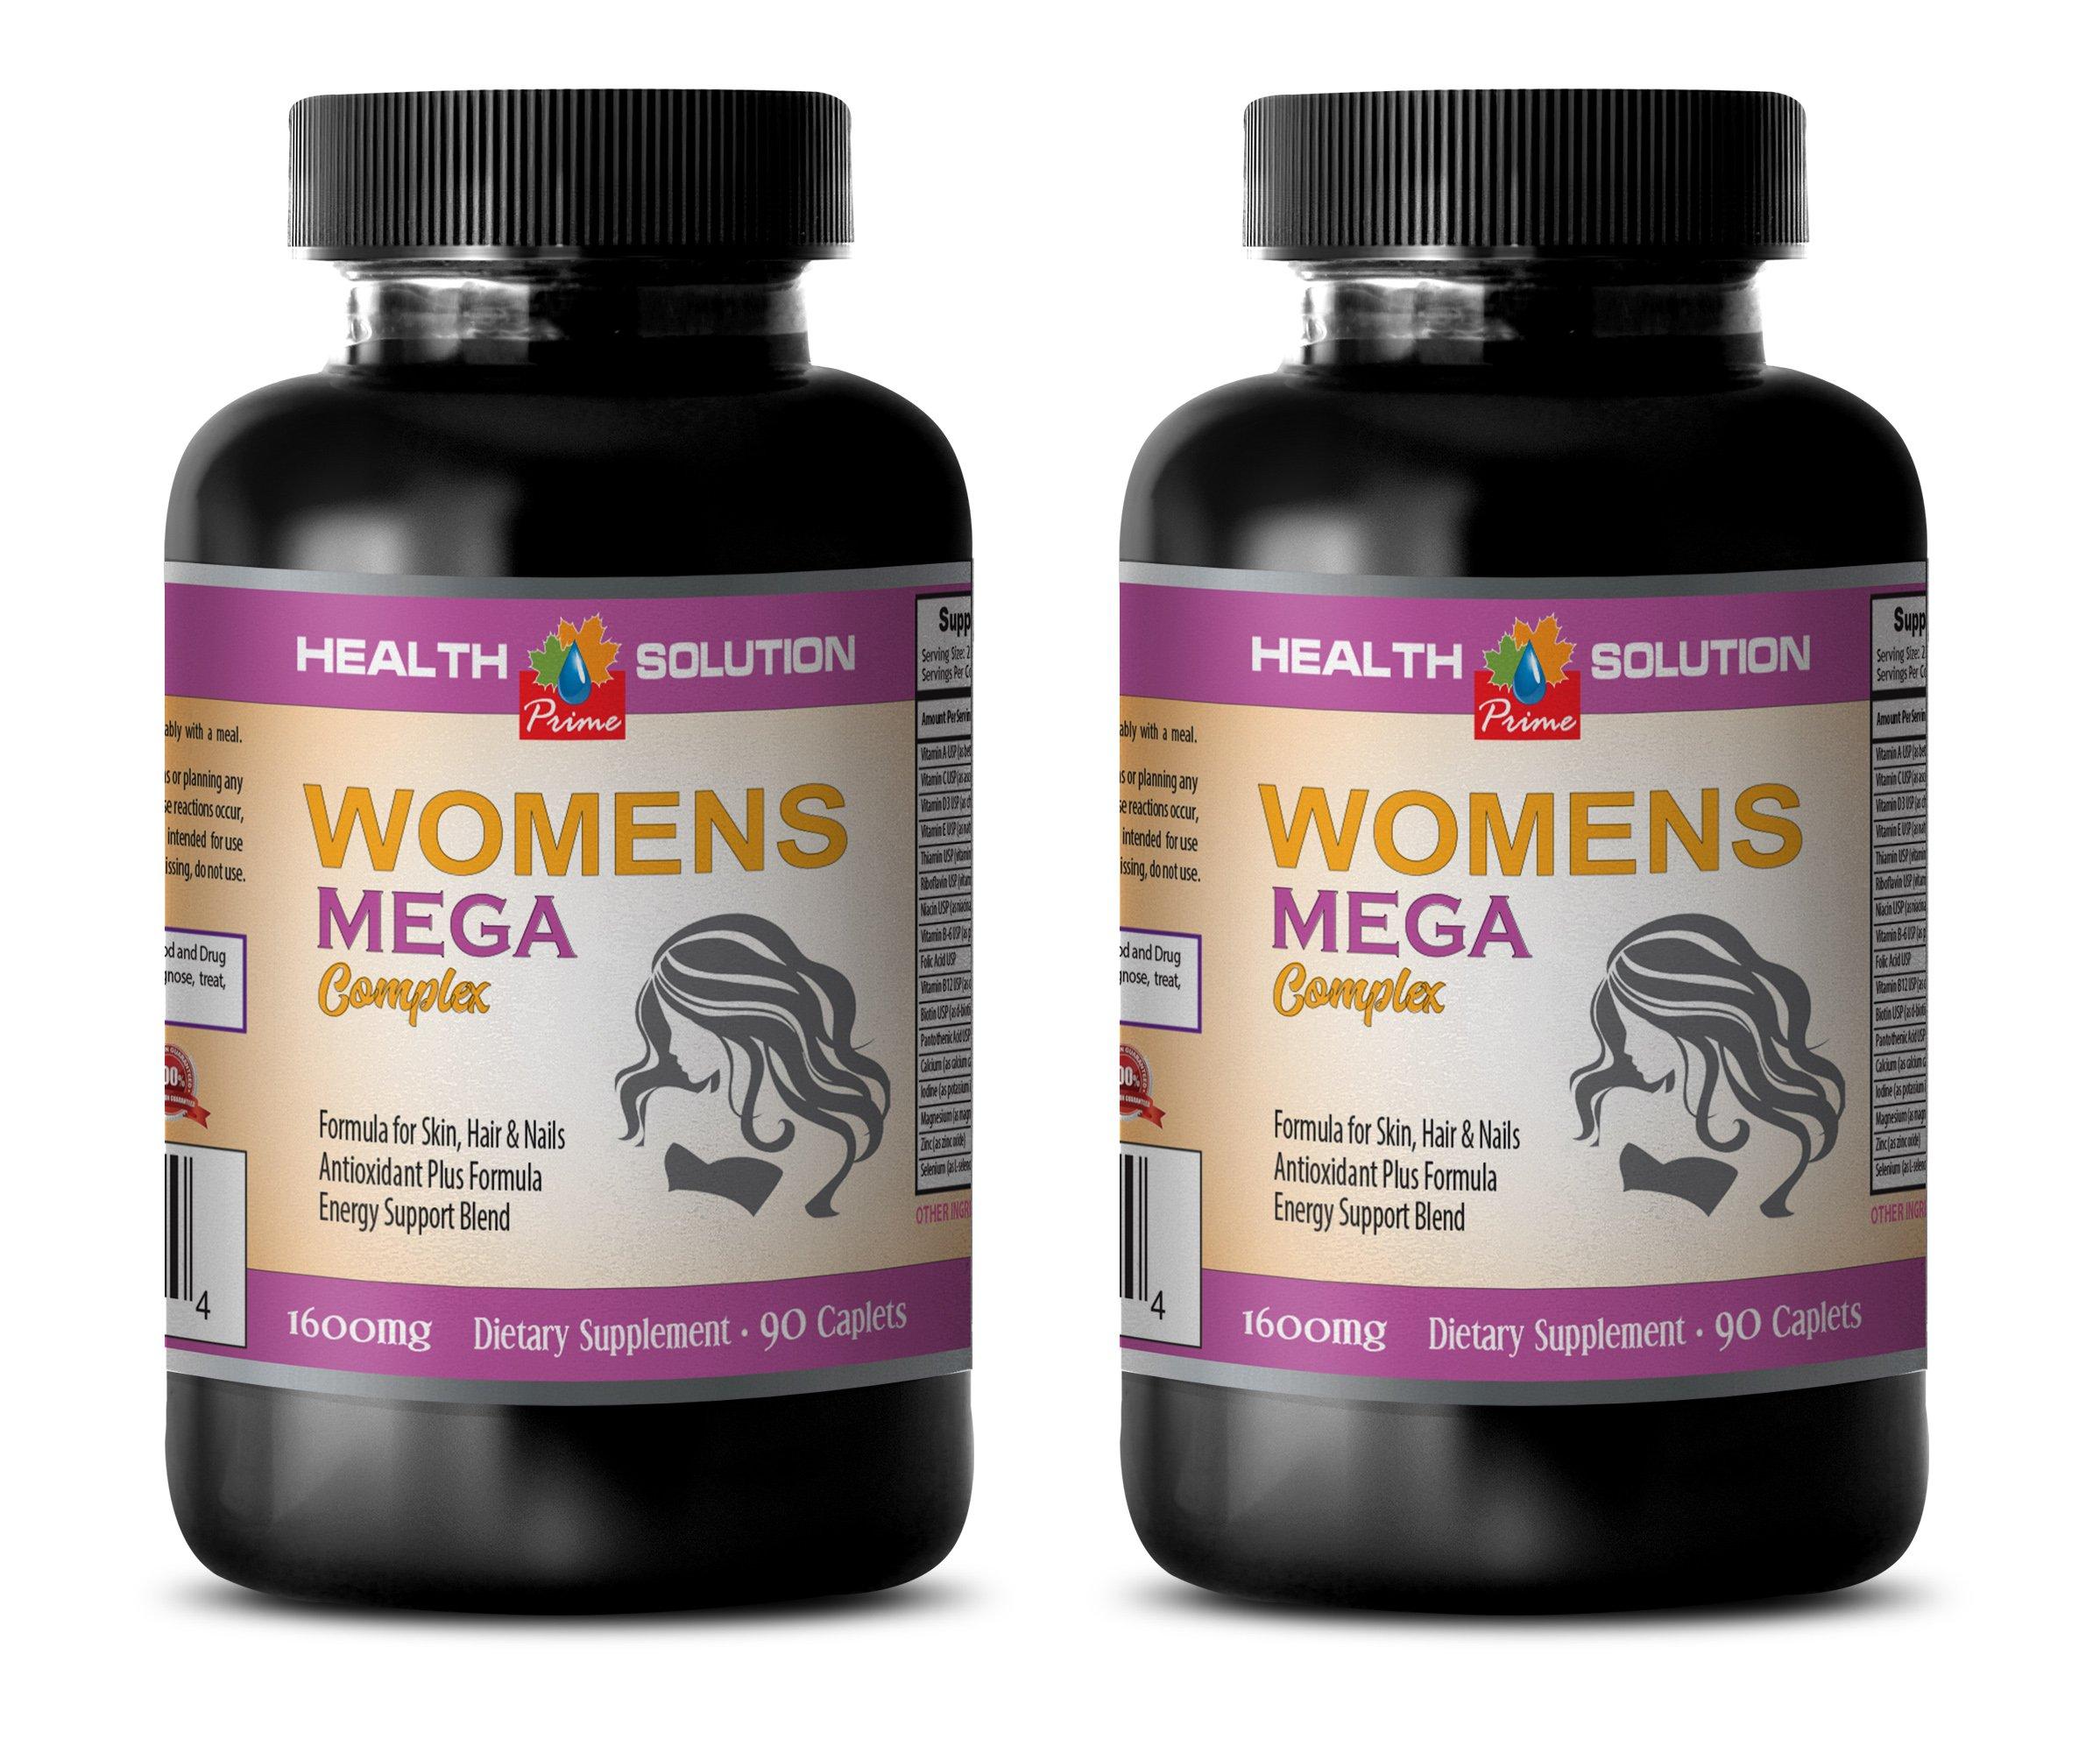 energy booster pills for women - WOMEN'S MEGA COMPLEX 1600 MG - grape seed extract for skin - 2 Bottles 180 Caplets